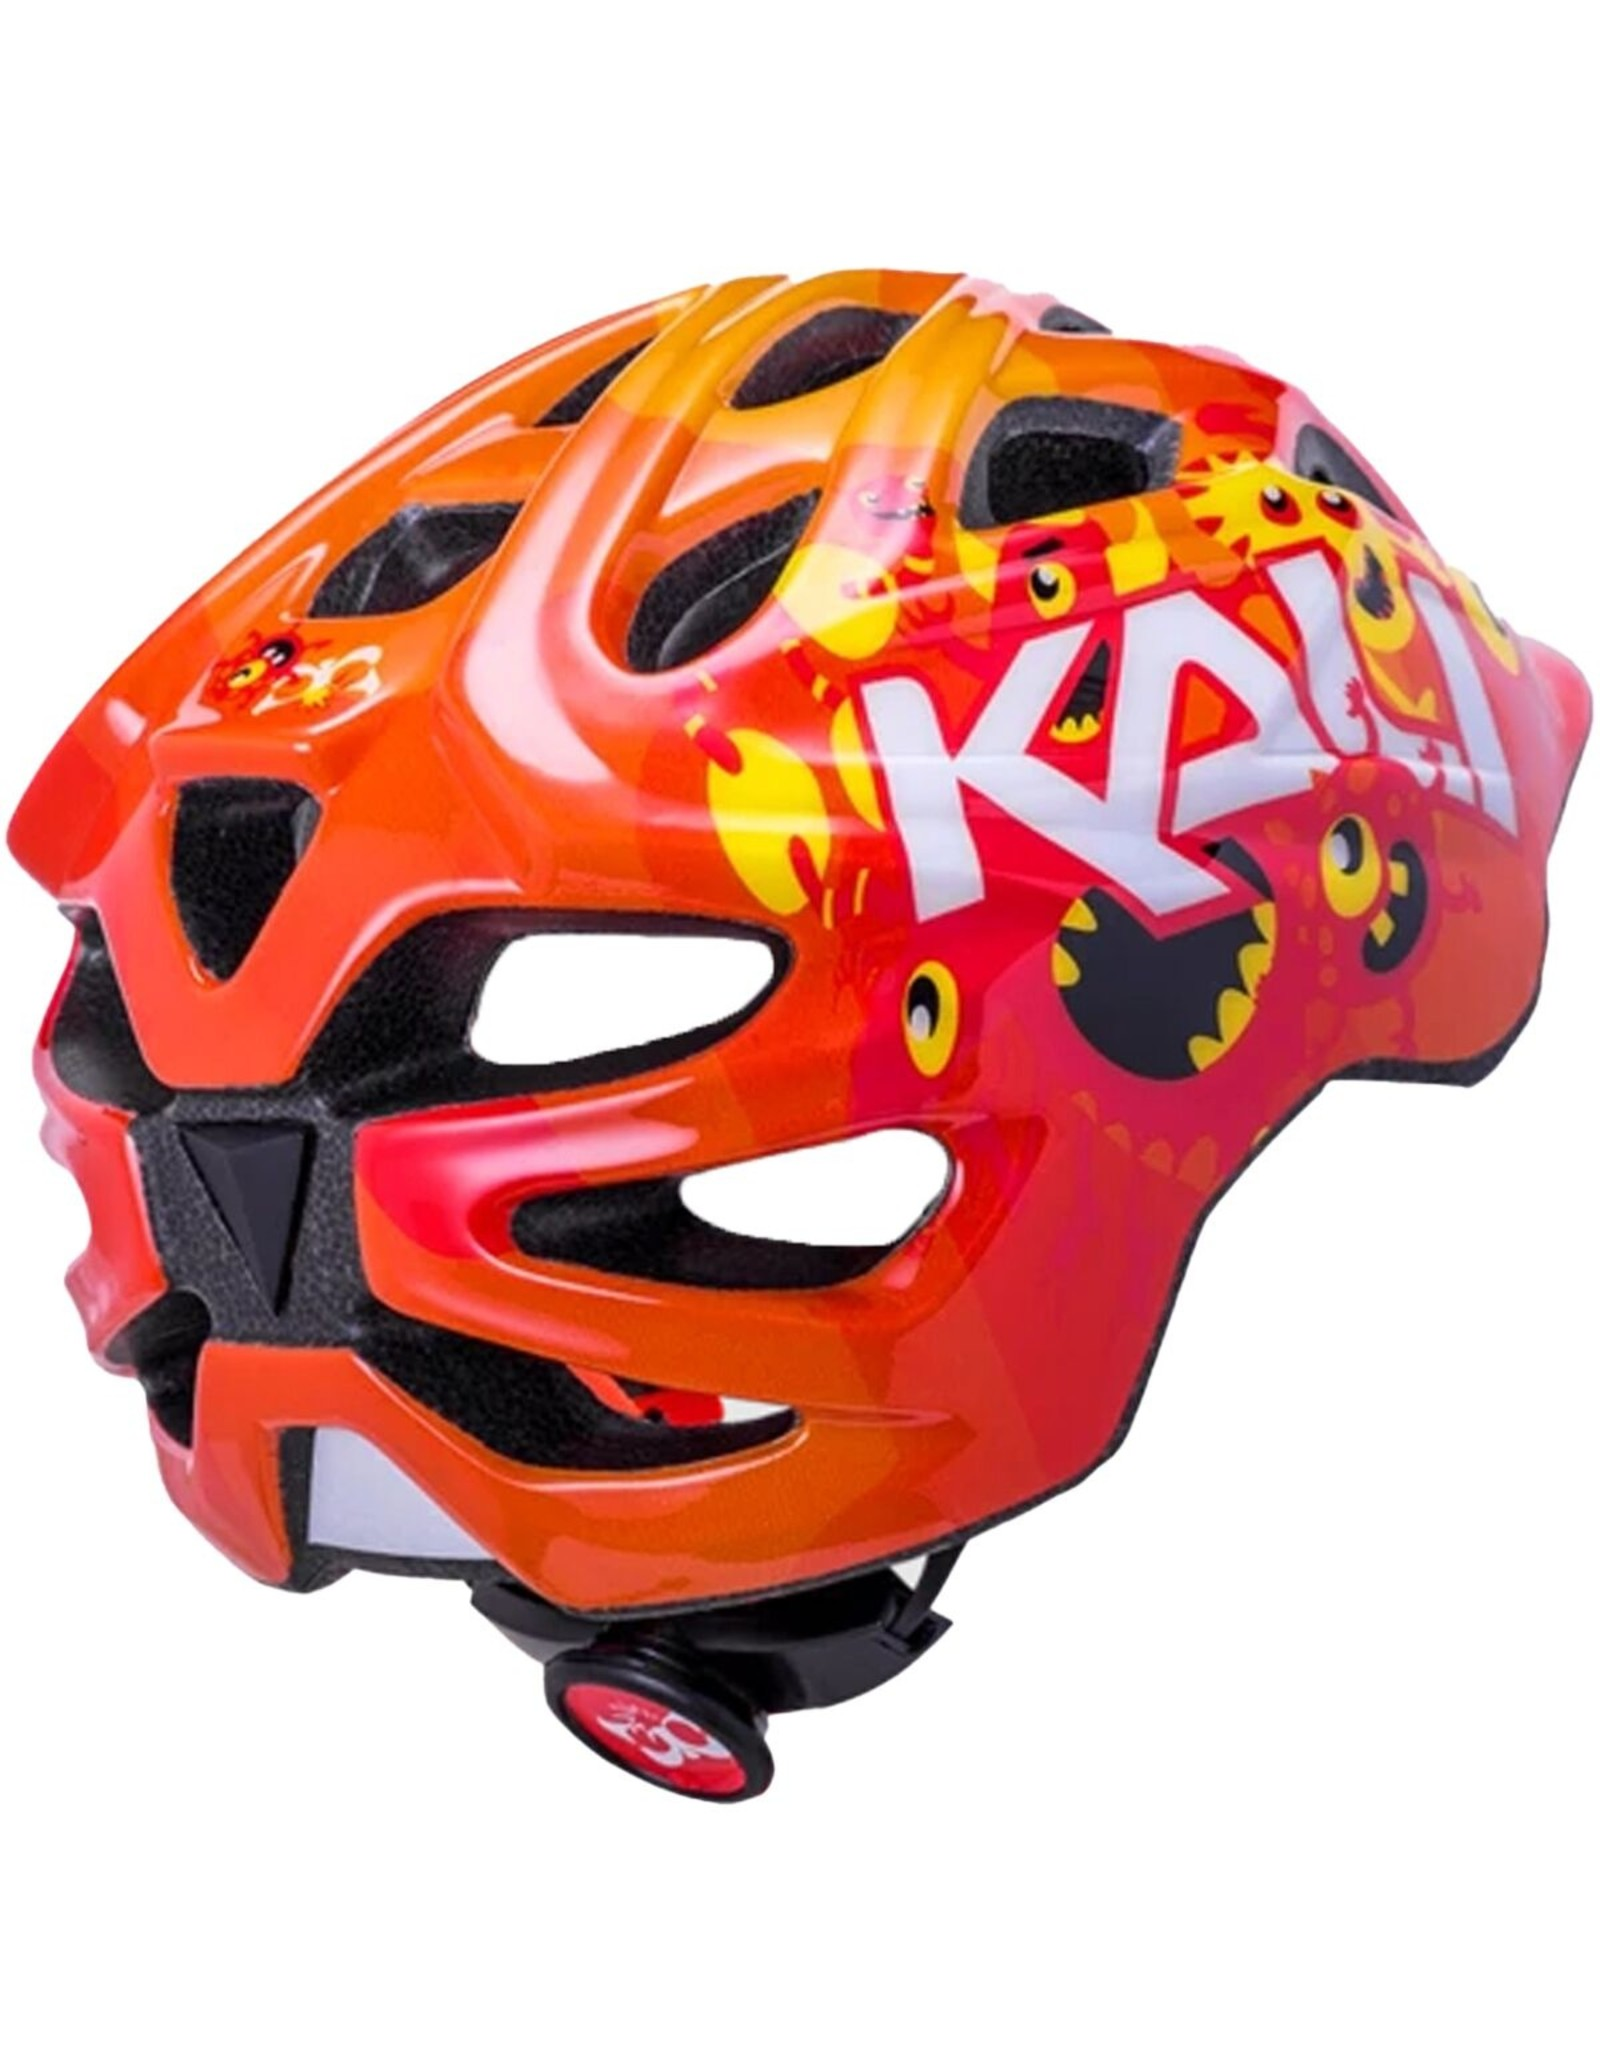 Kali Protectives Kali Protectives Chakra Child Helmet